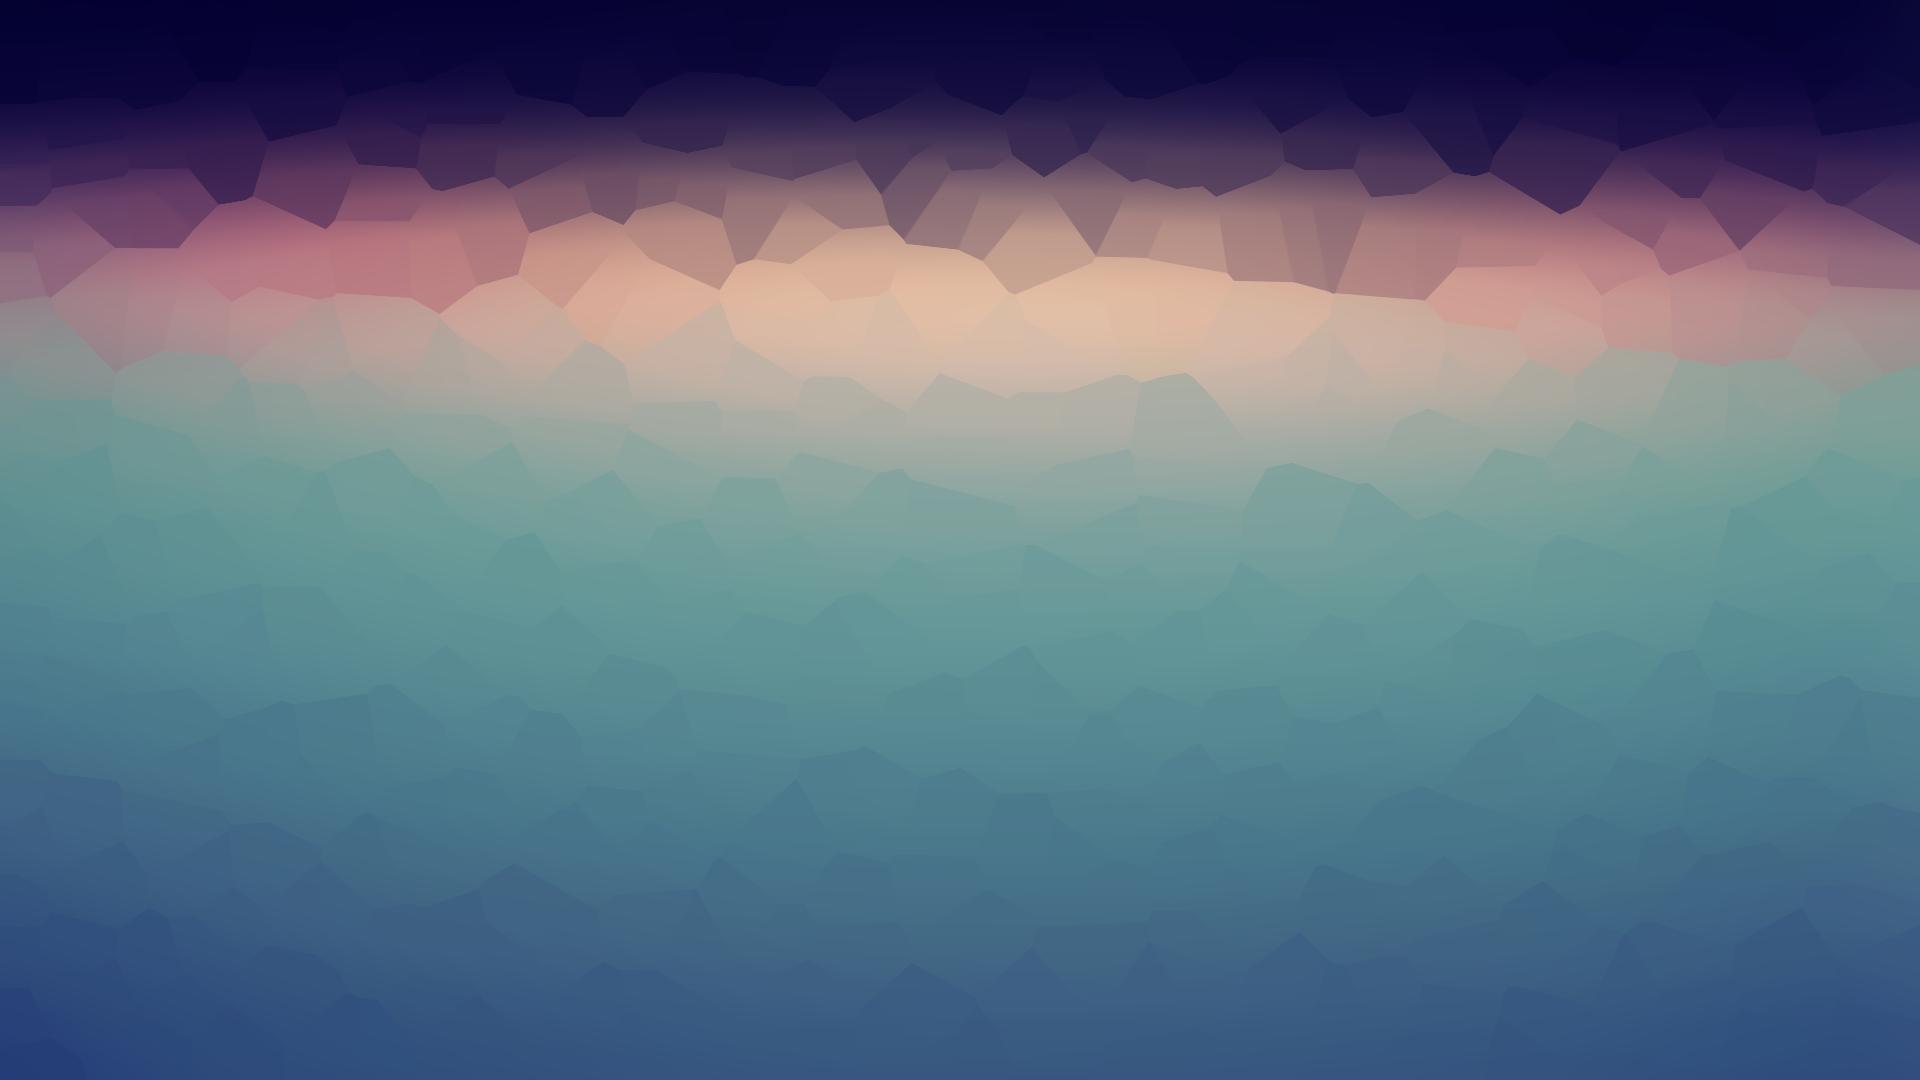 Flat-Design-Wallpapers-HD.png